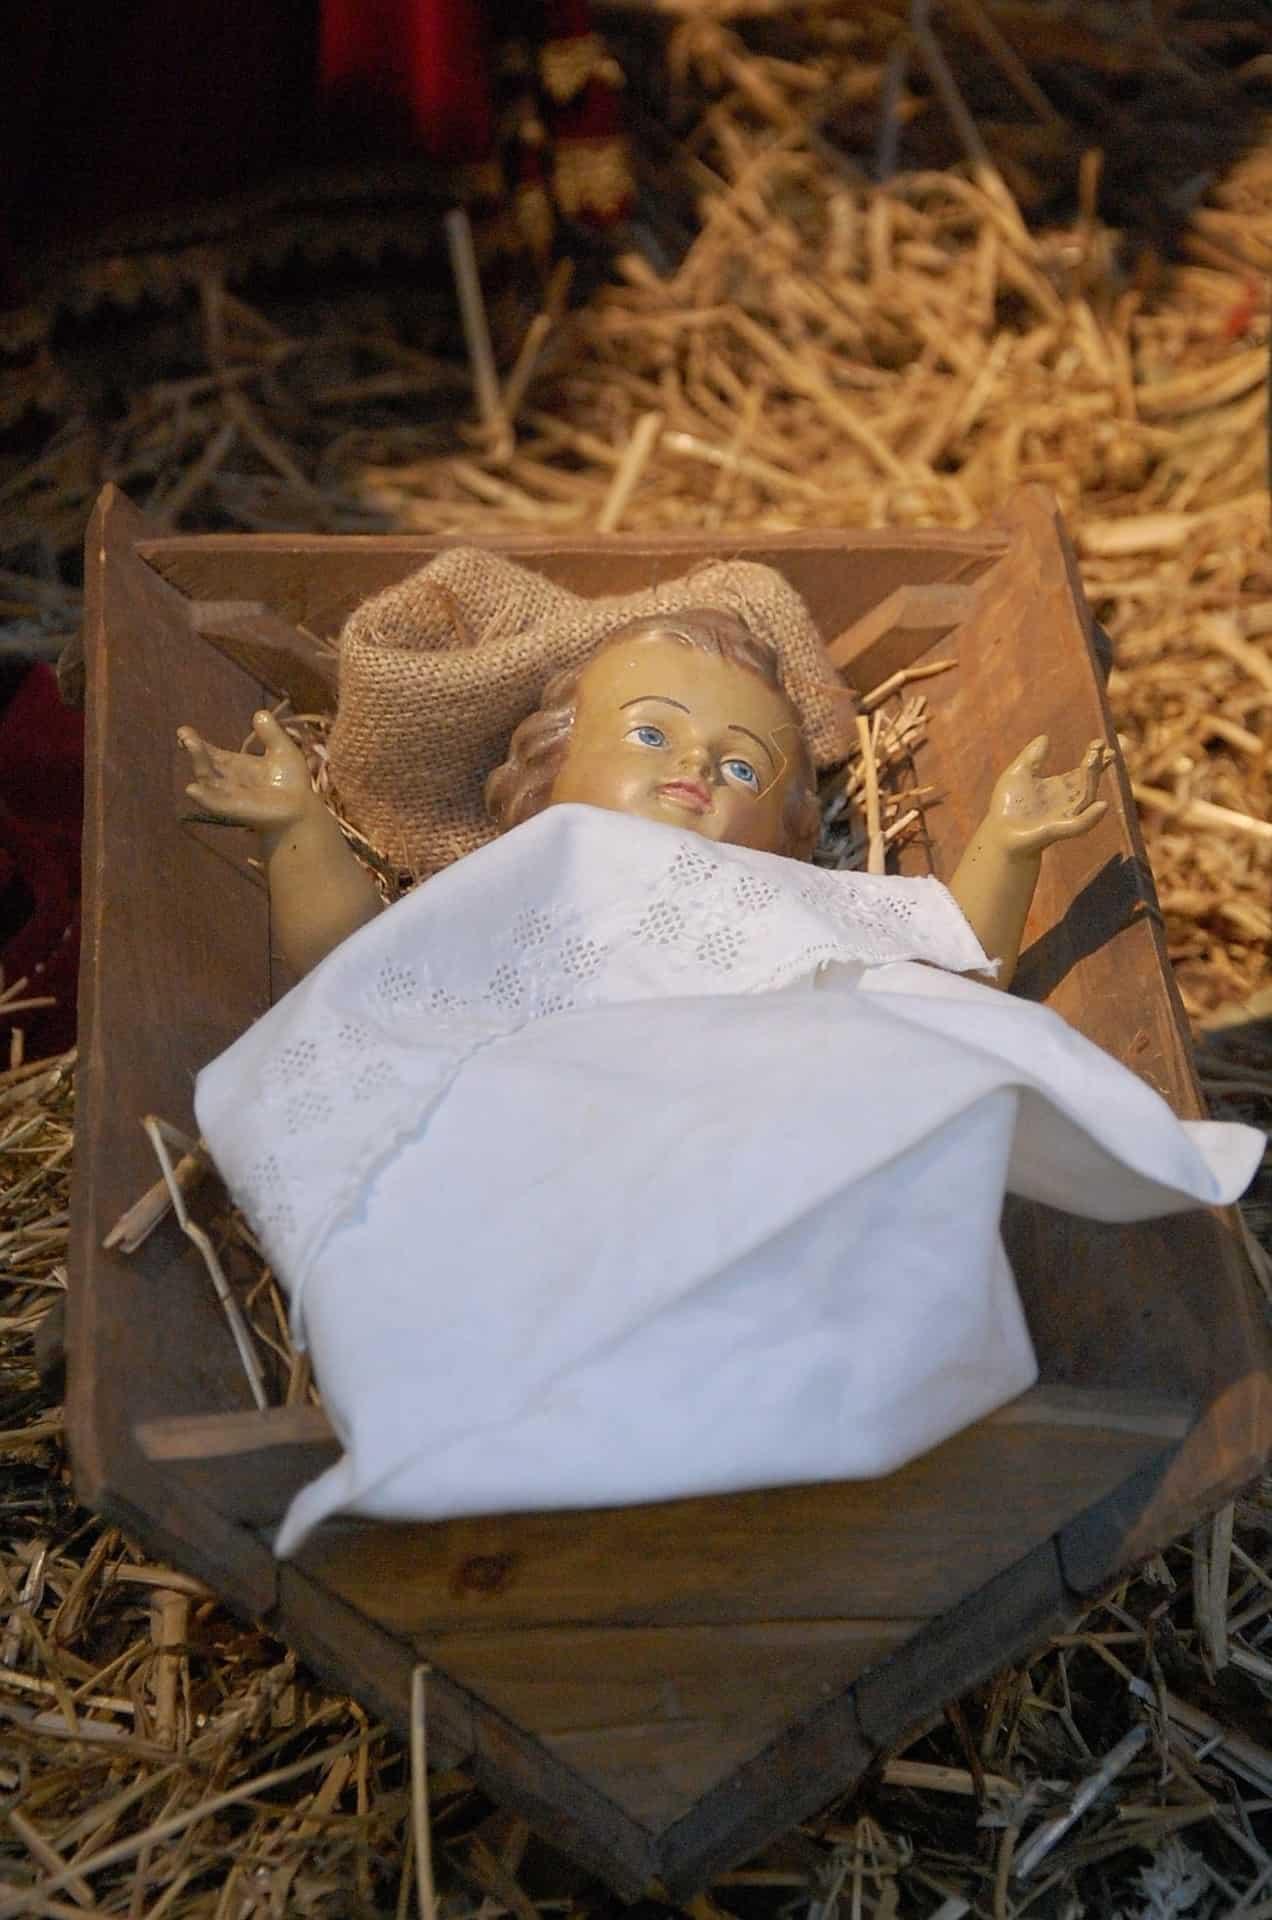 baby Jesus statue in manger